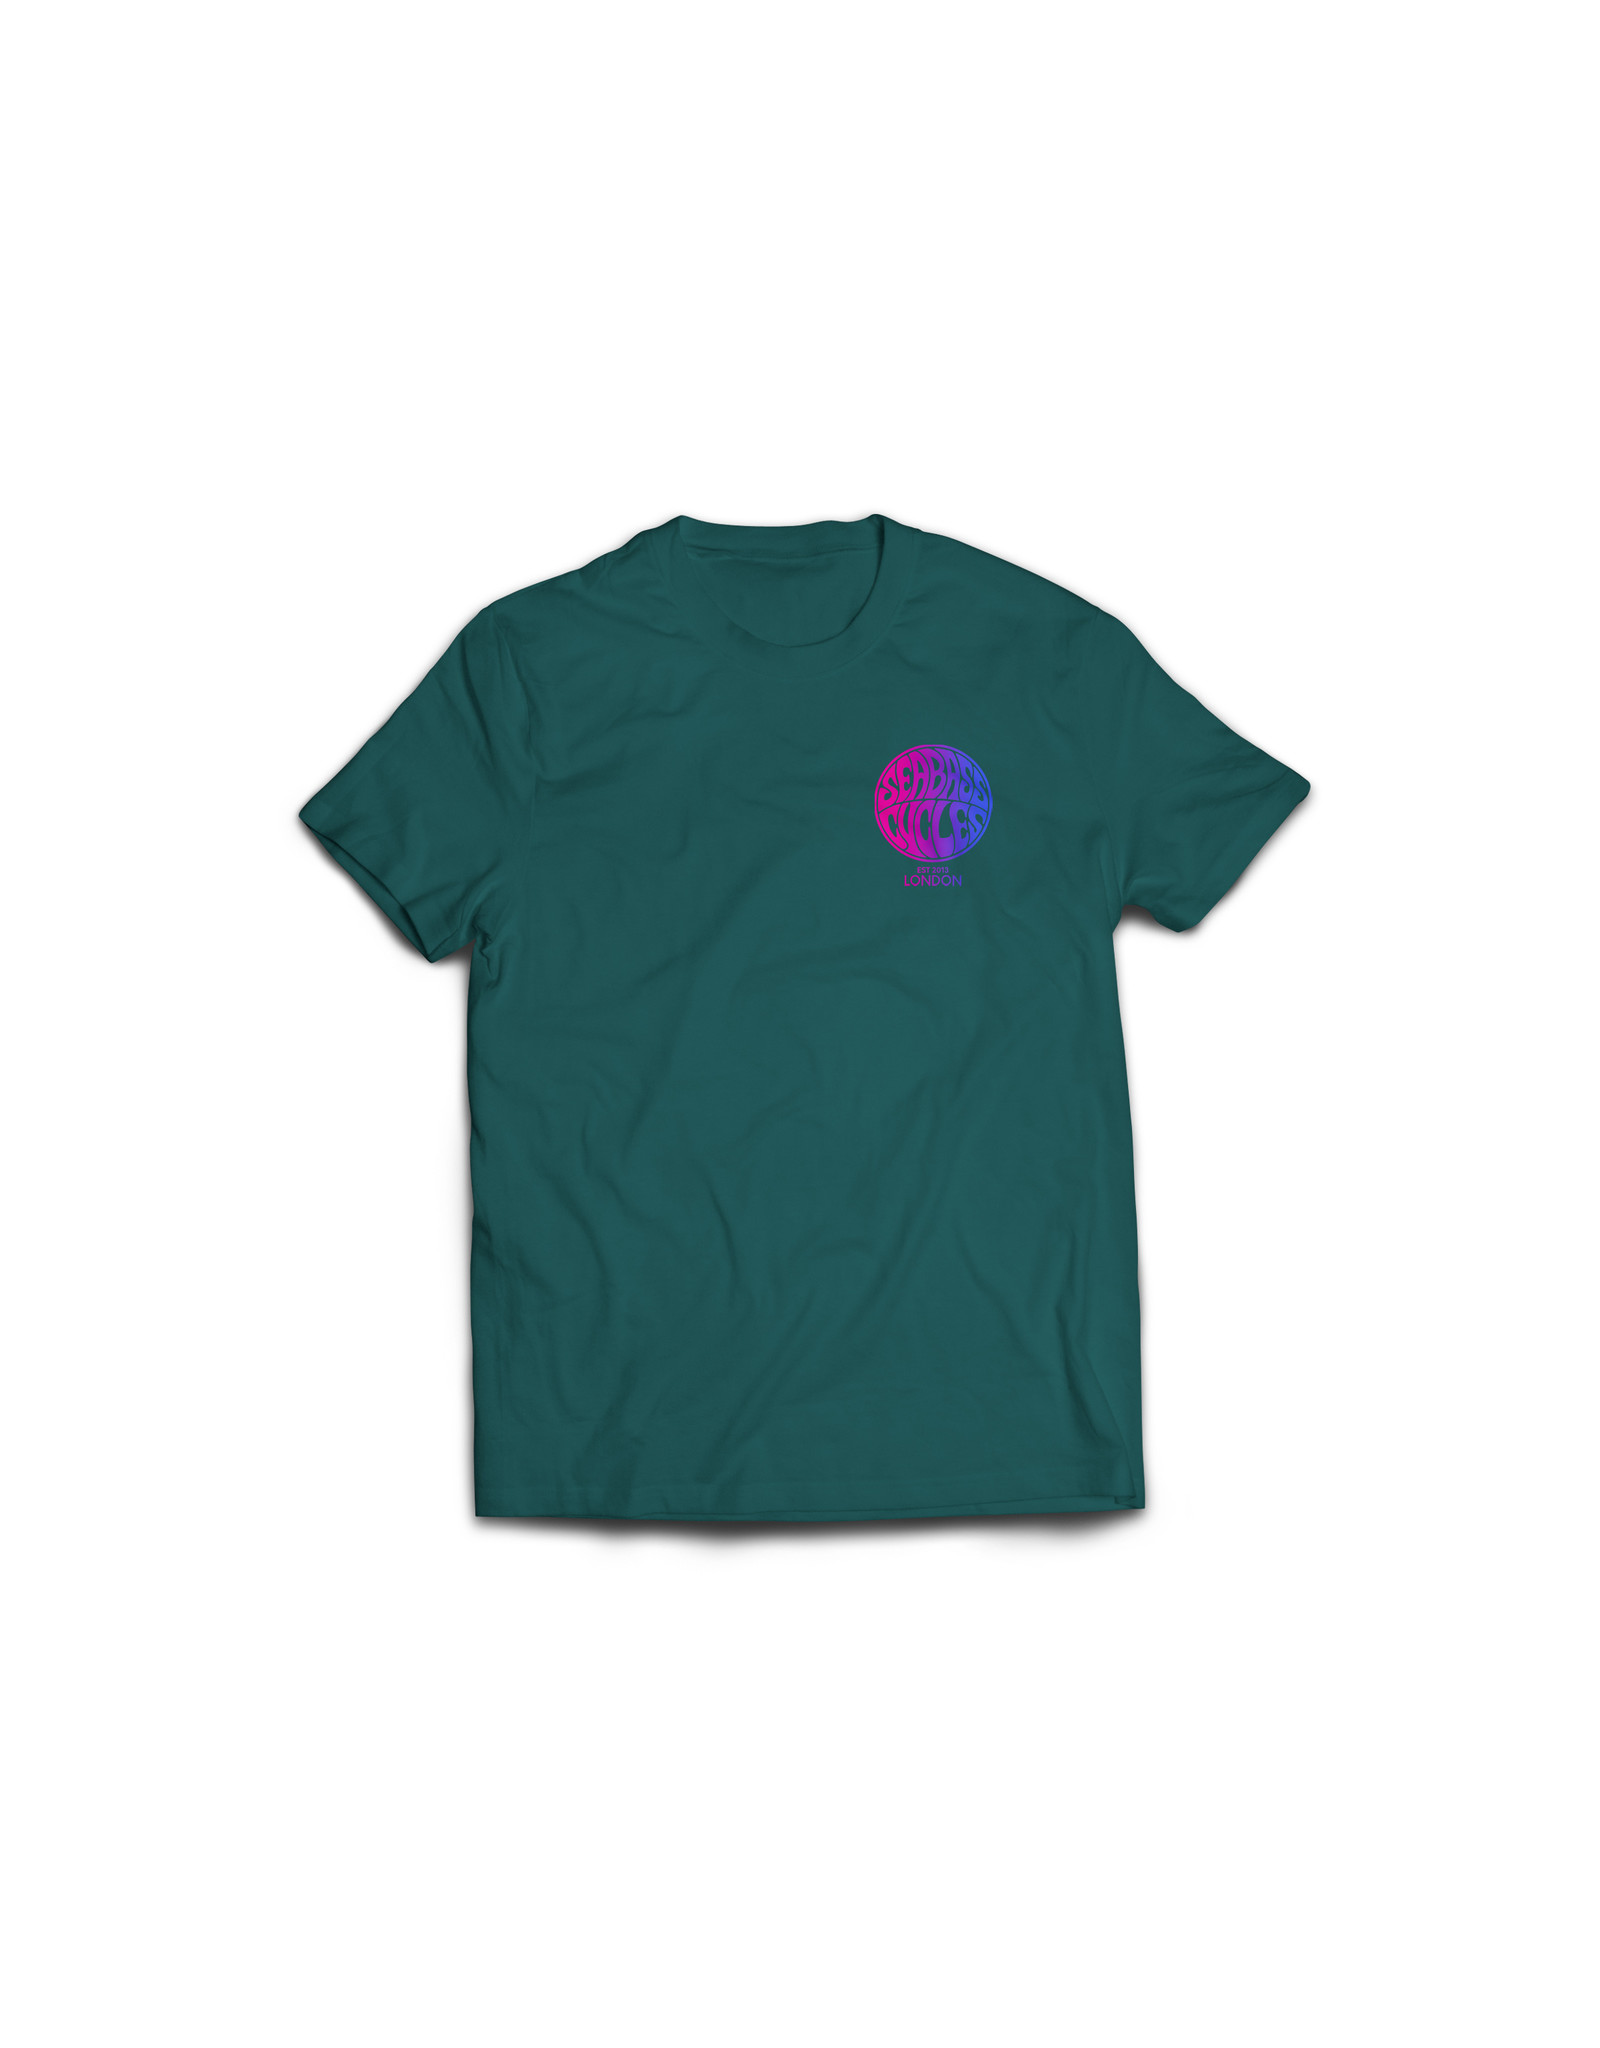 Seabass Cycles Seabass Cycles - Circle Logo Kids TShirt - Green